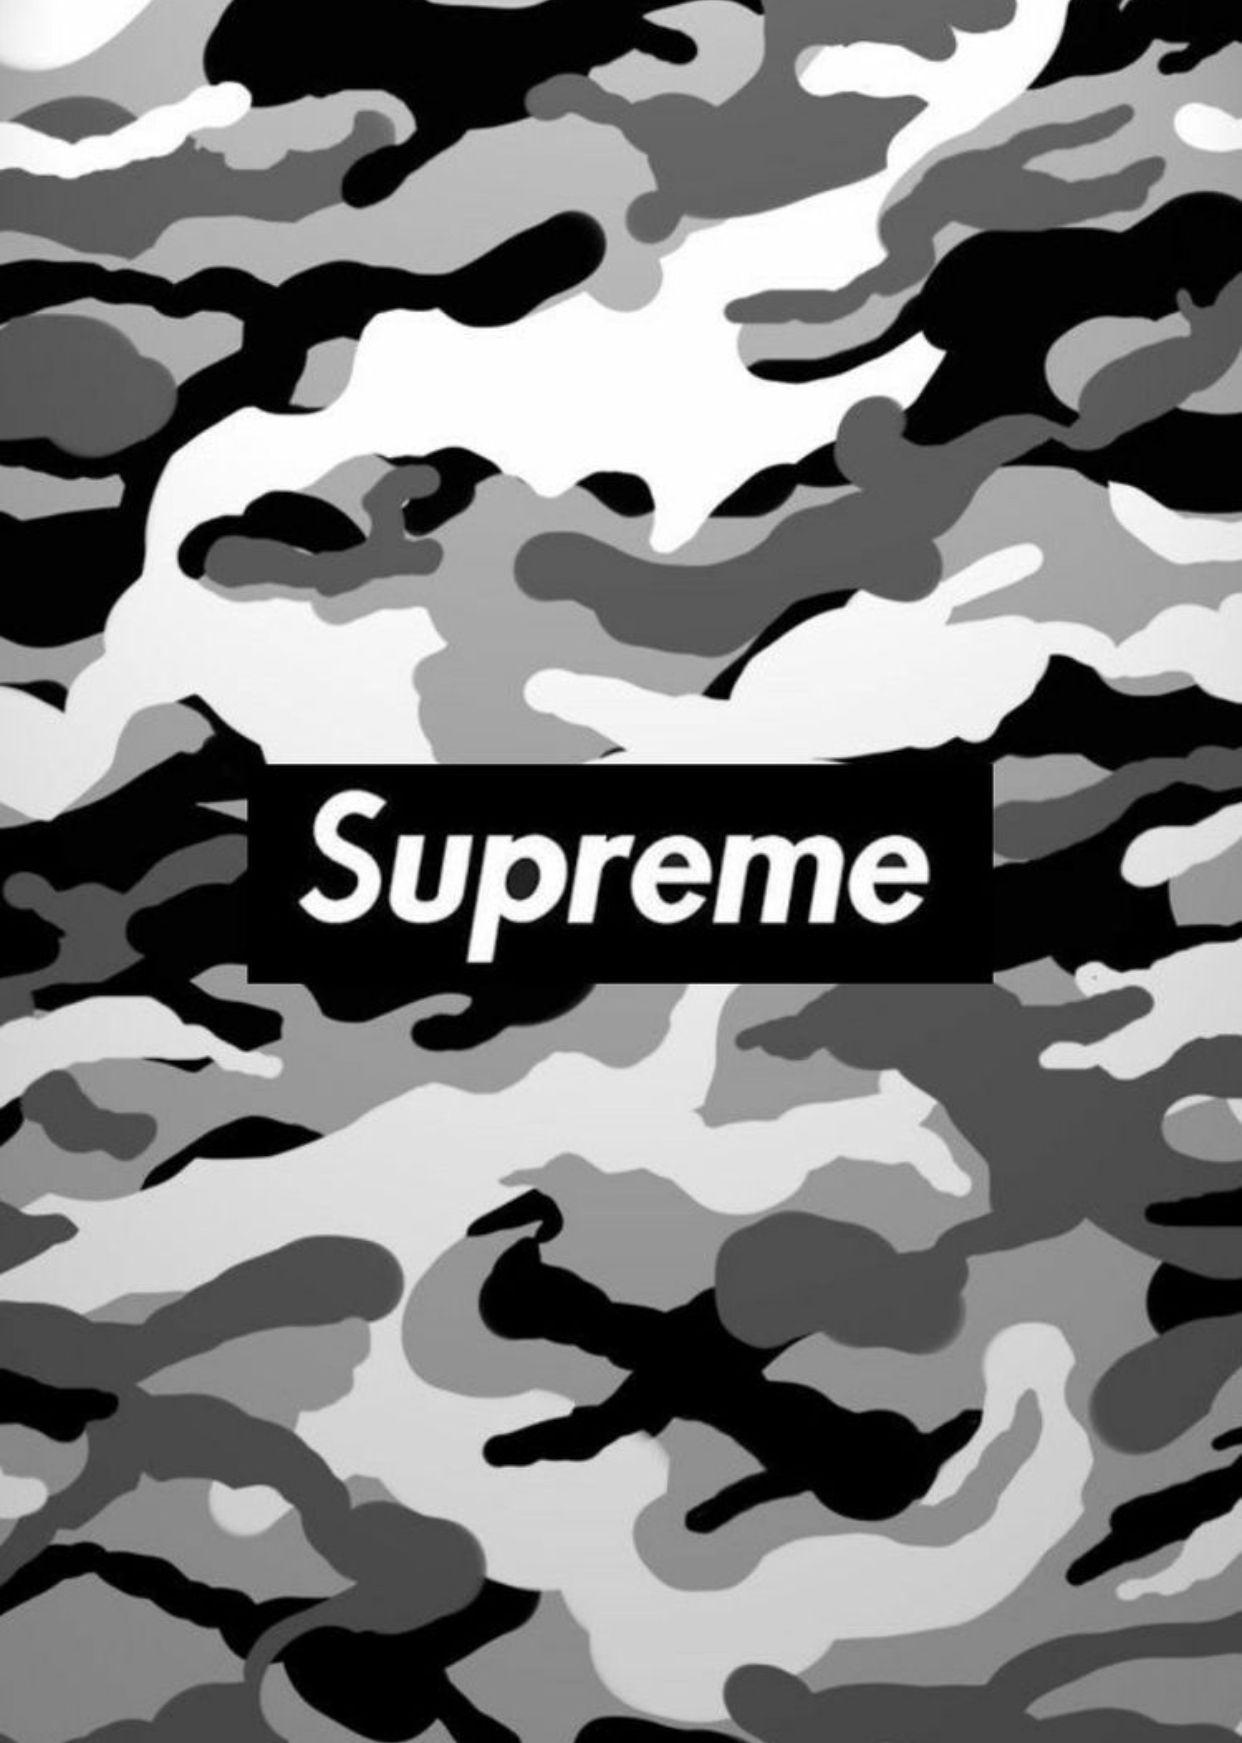 Supreme BAPE Camo Wallpapers Top Free Supreme BAPE Camo